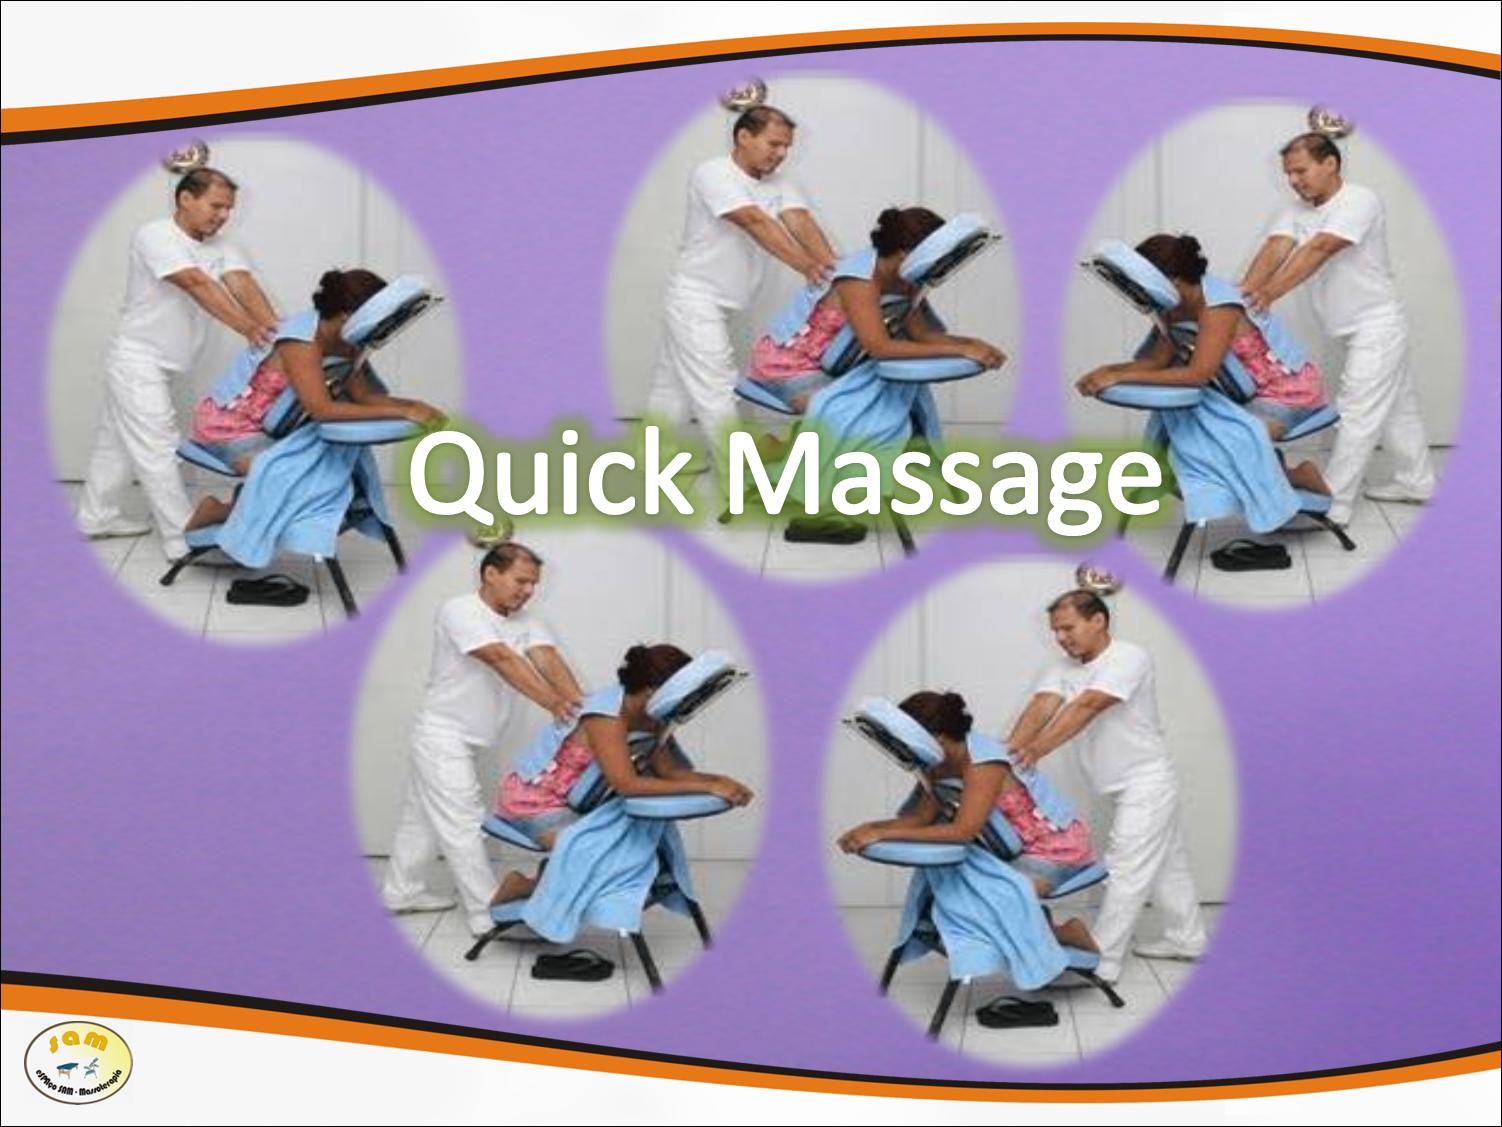 Conheça a Quick massage